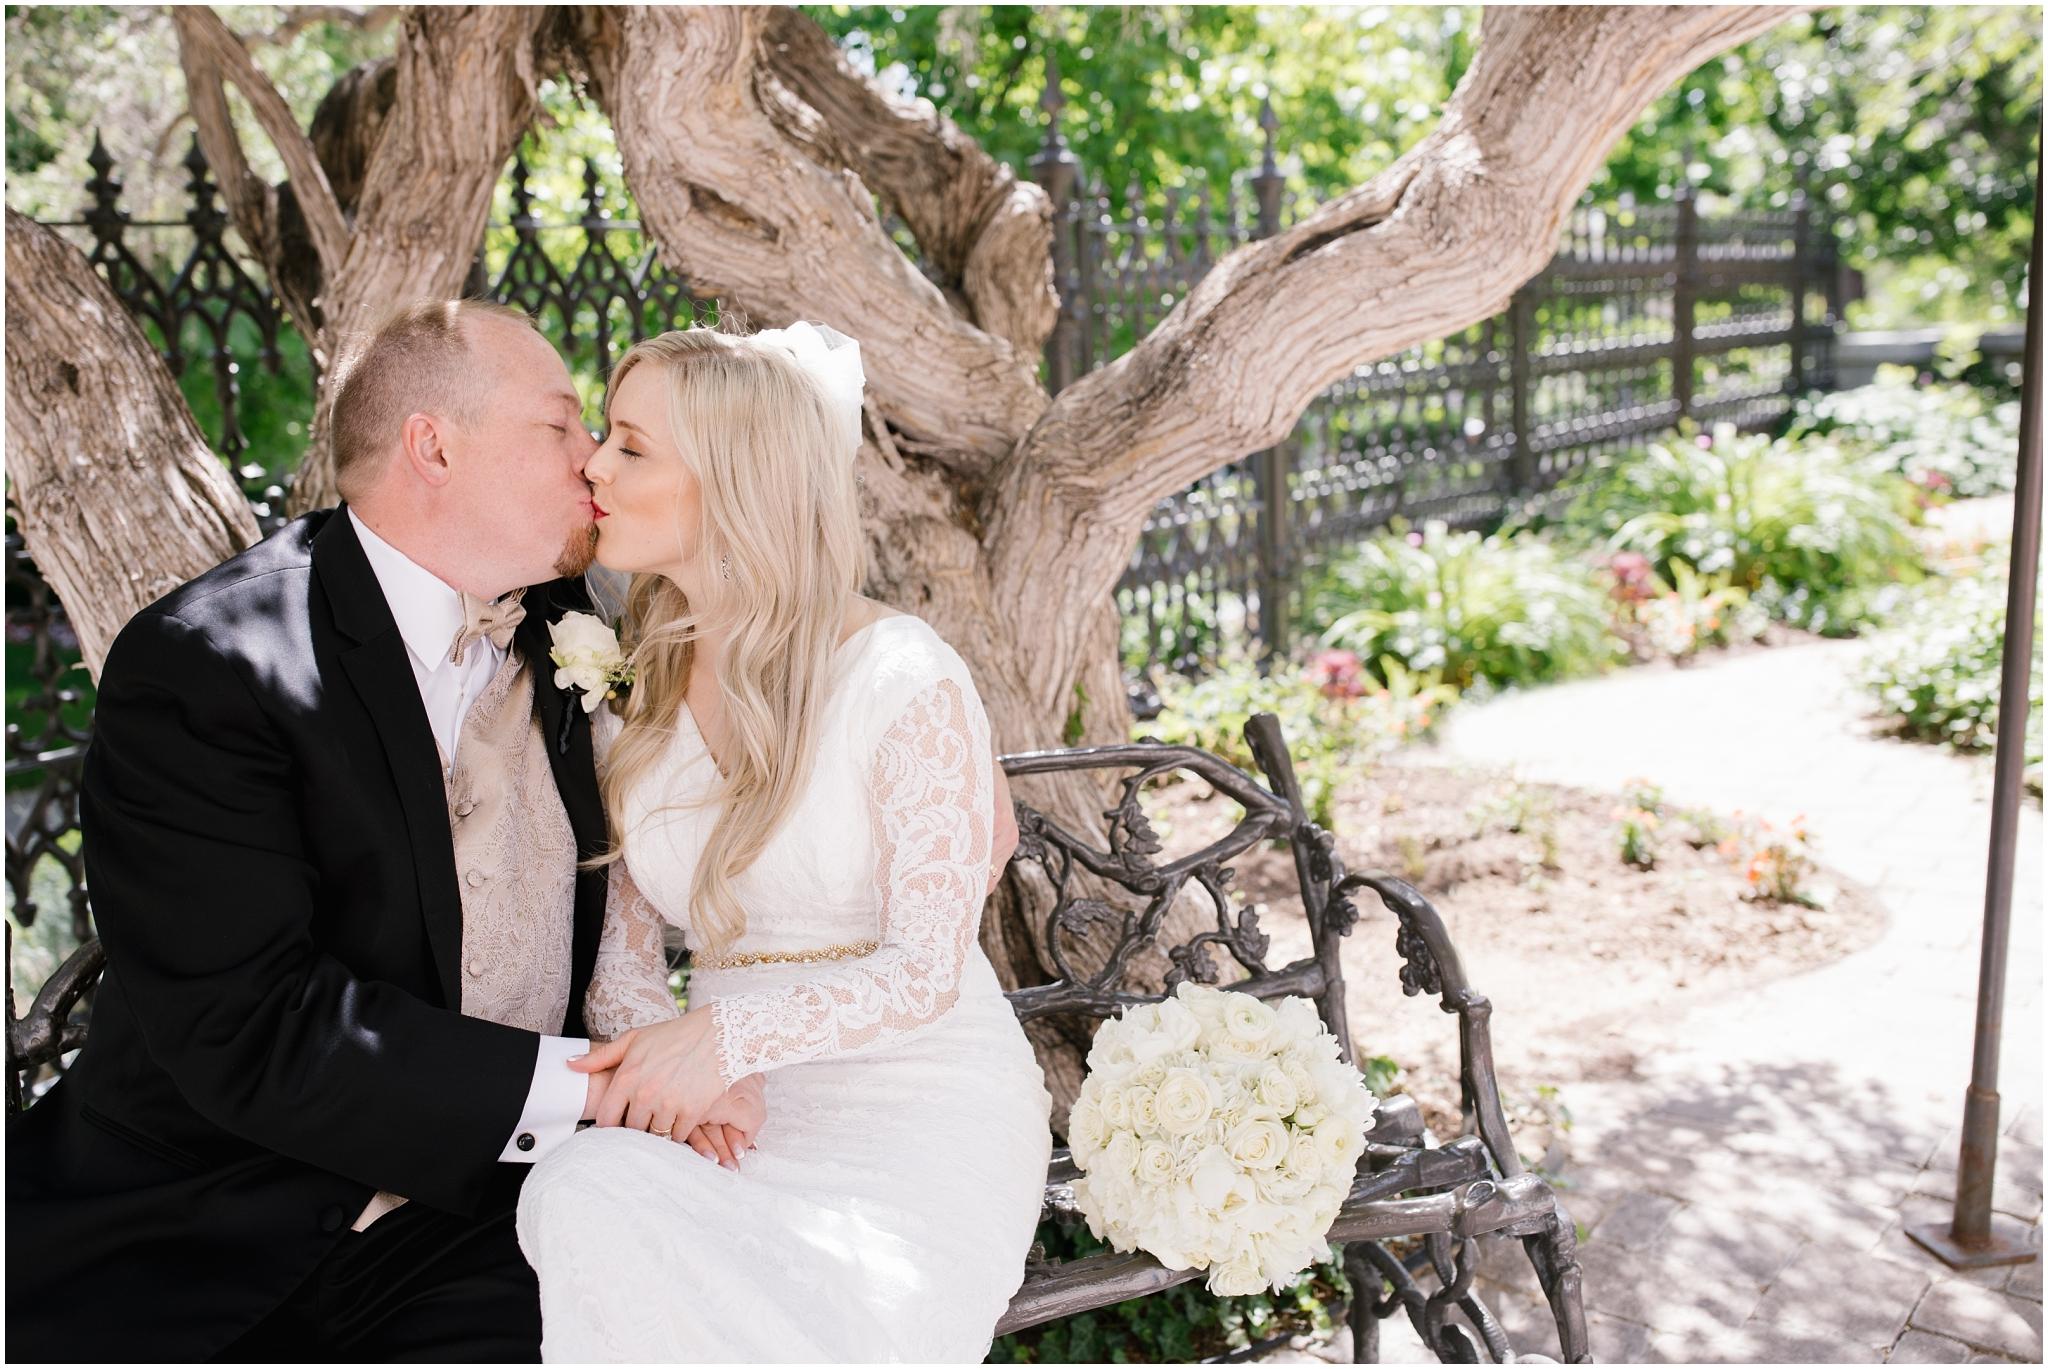 CherylandTyler-199_Lizzie-B-Imagery-Utah-Wedding-Photographer-Salt-Lake-City-Temple-Wells-Fargo-Building-Reception.jpg